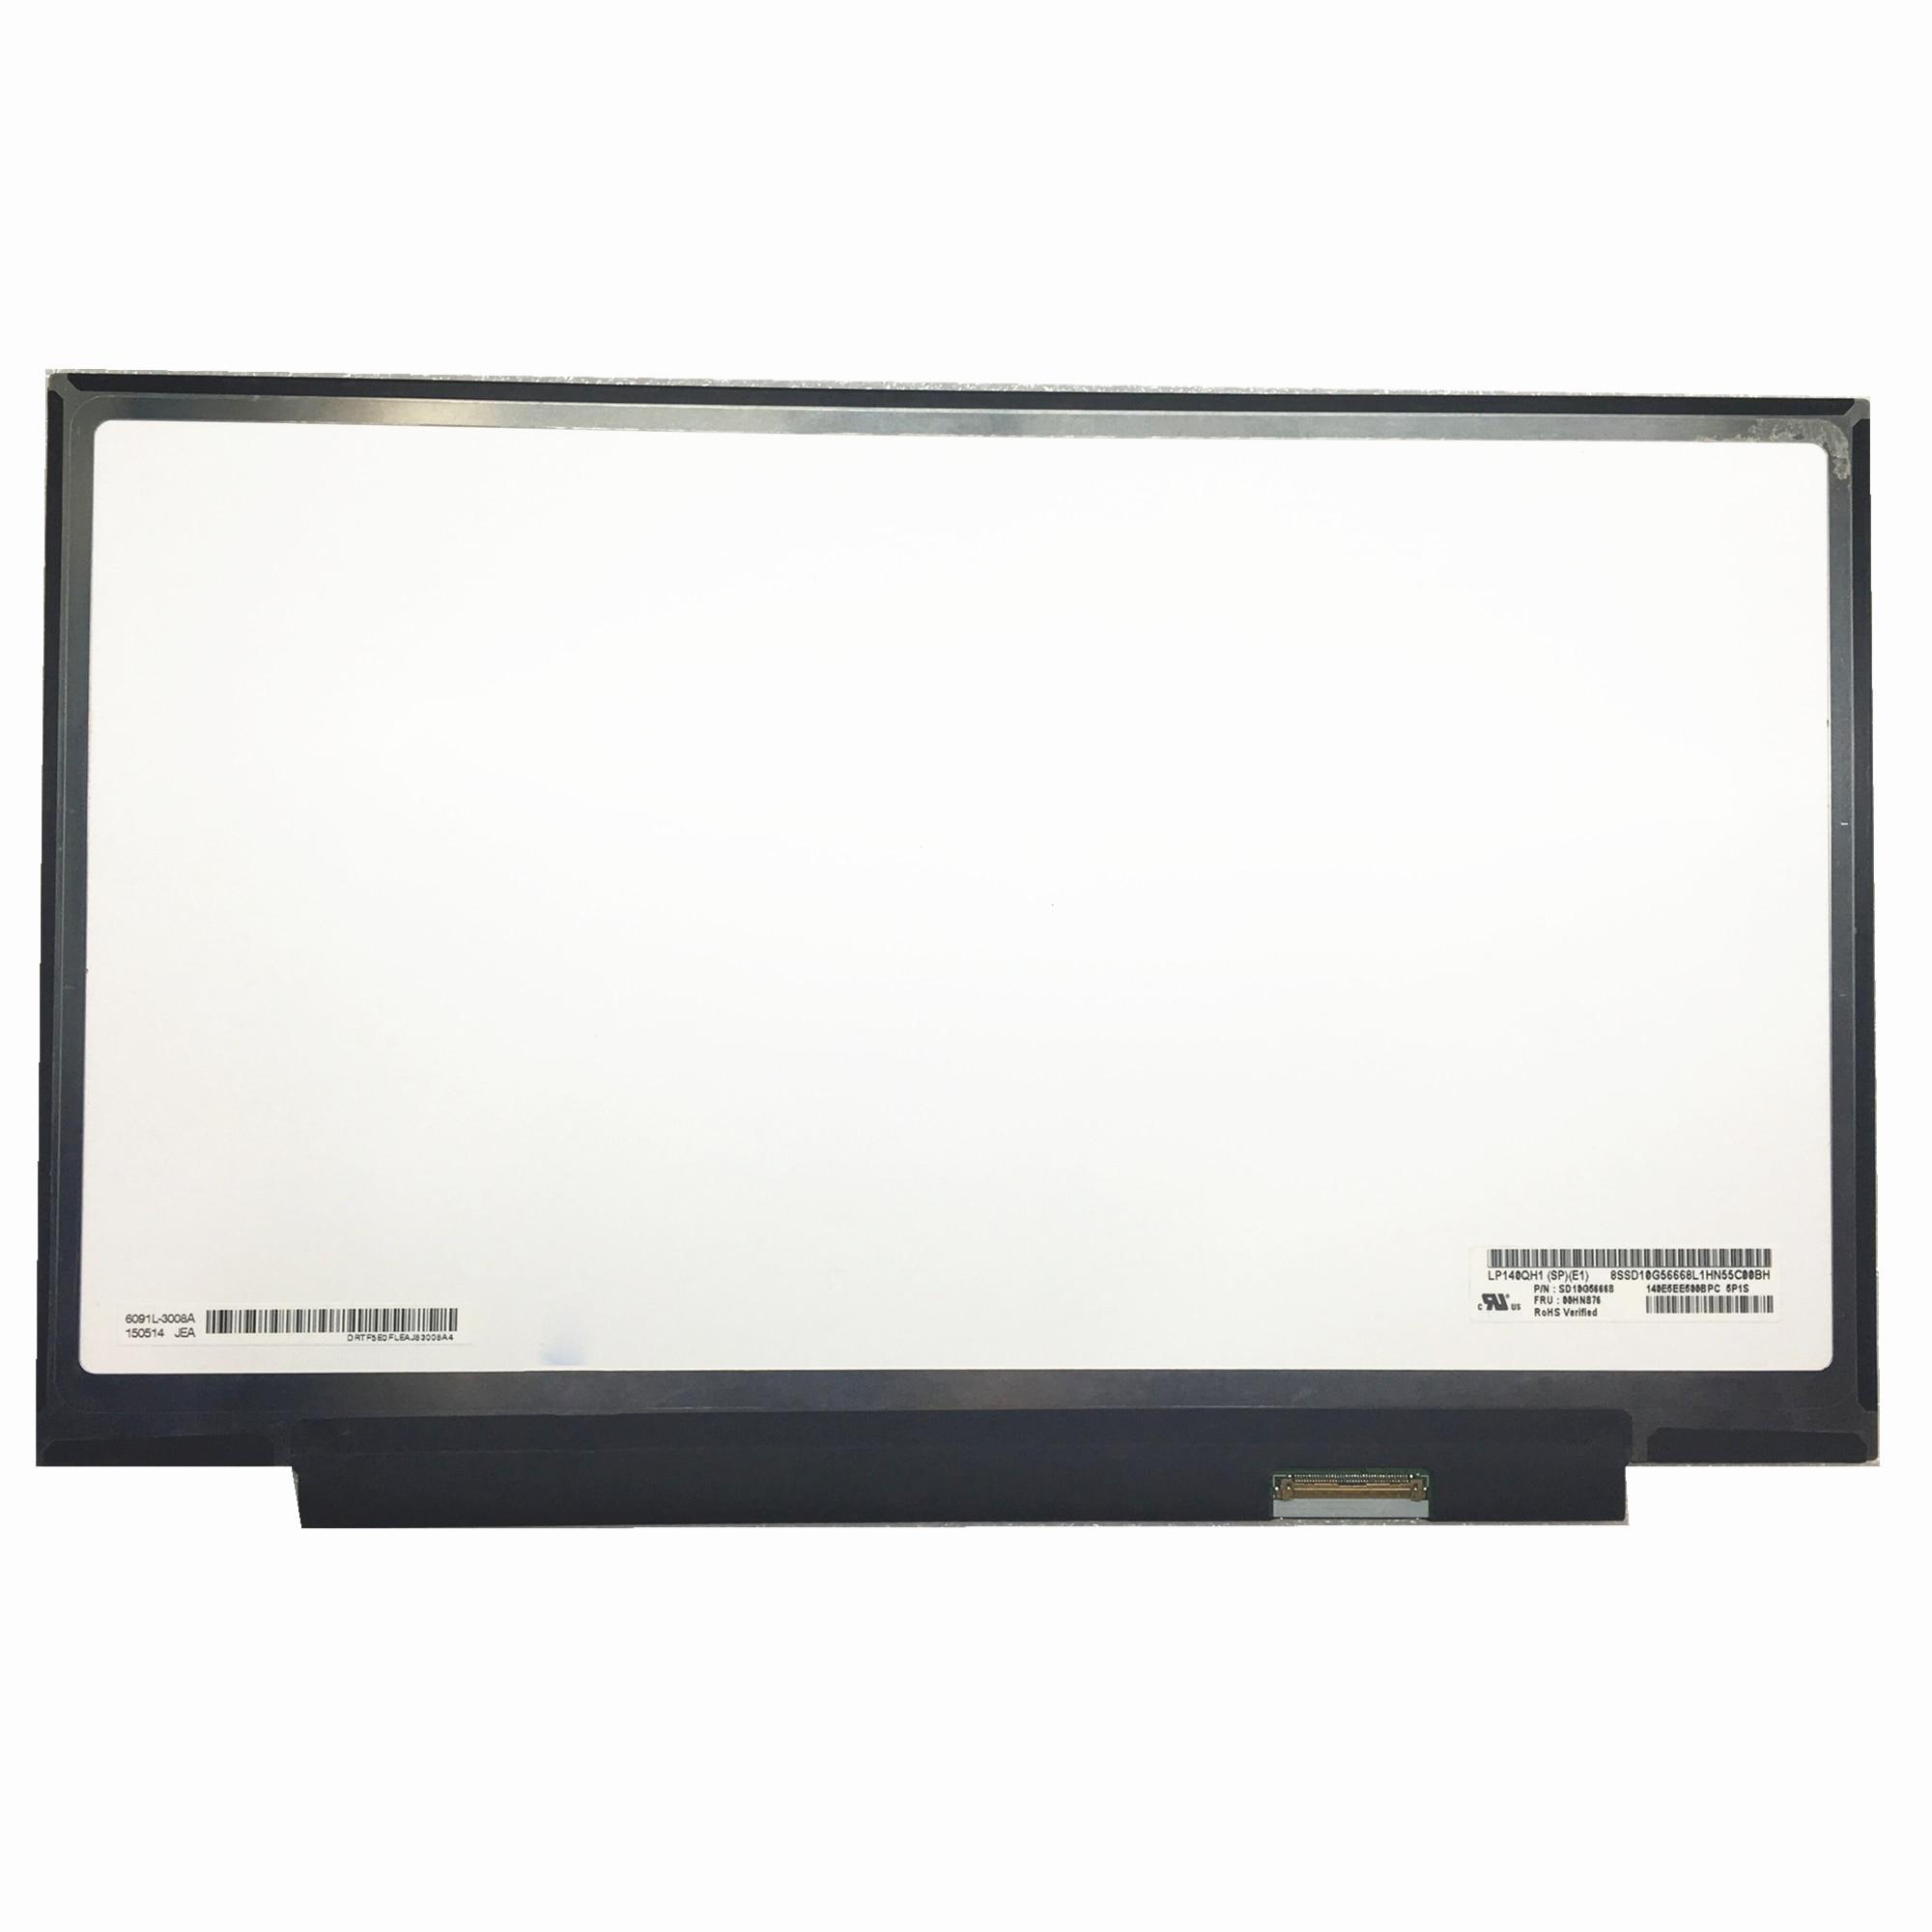 Frete grátis LP140QH1-SPE1 lp140qh1 spe1 portátil tela lcd 2560*1440 com fru 00hn876